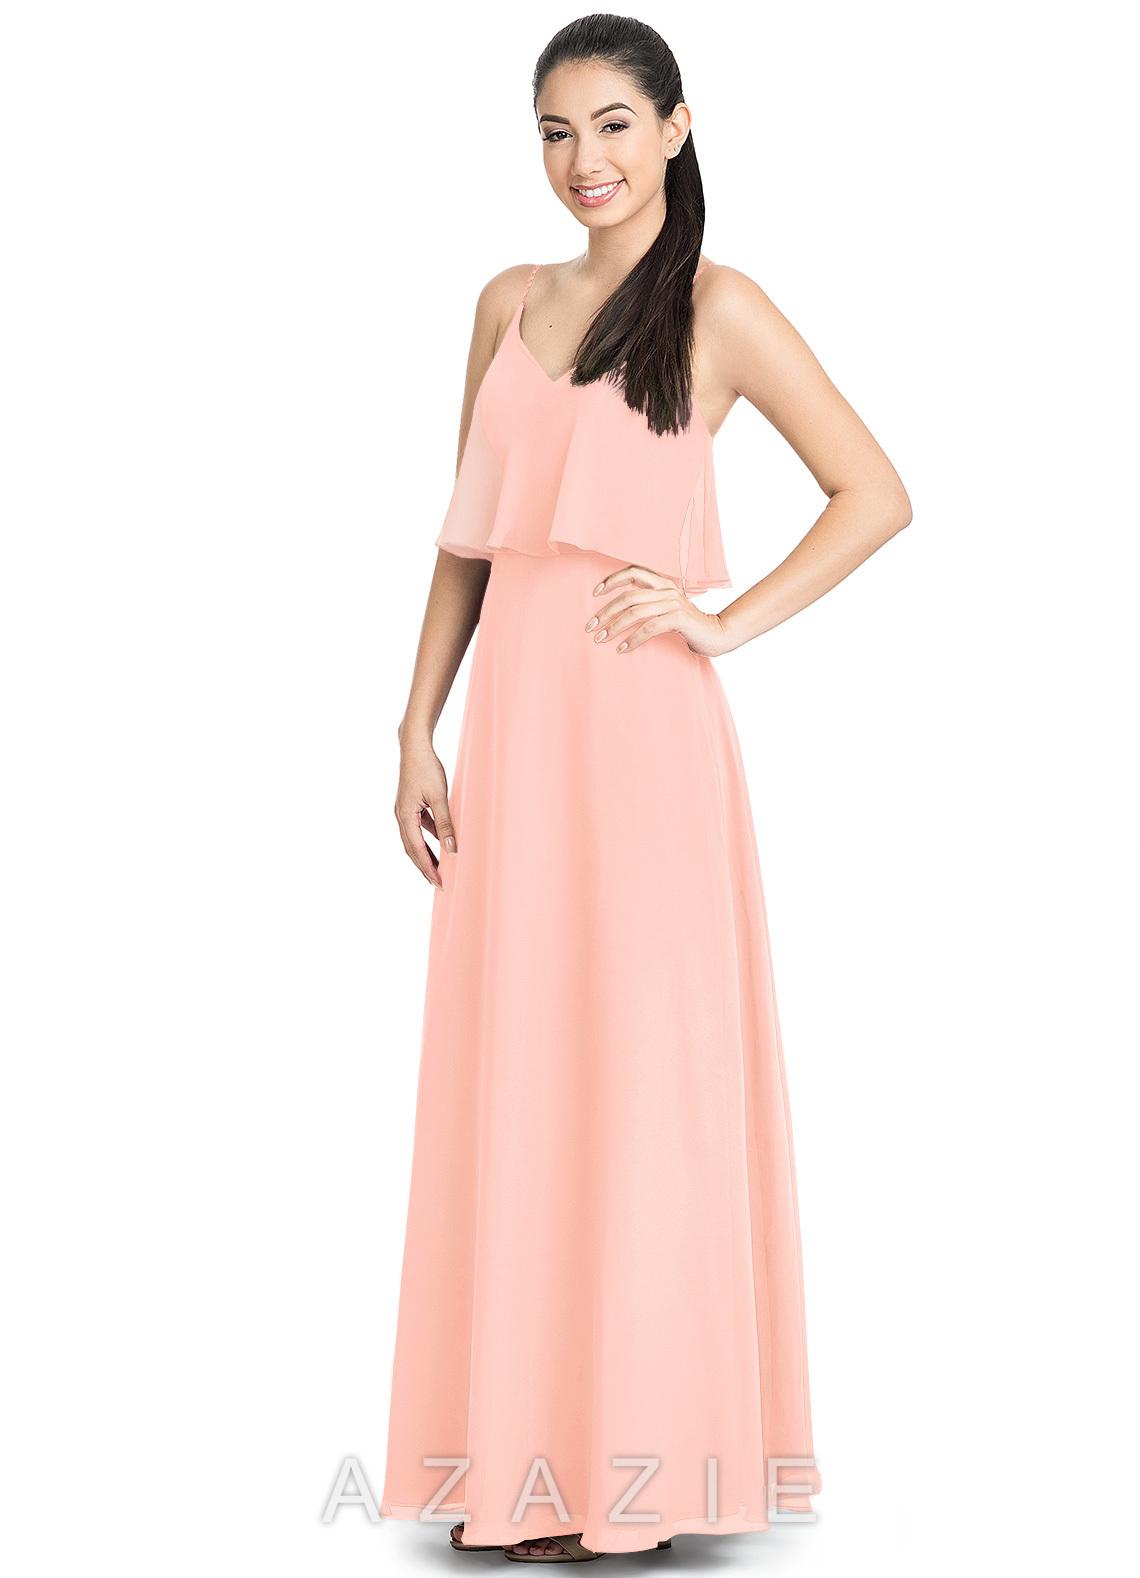 Azazie Desiree Bridesmaid Dress | Azazie